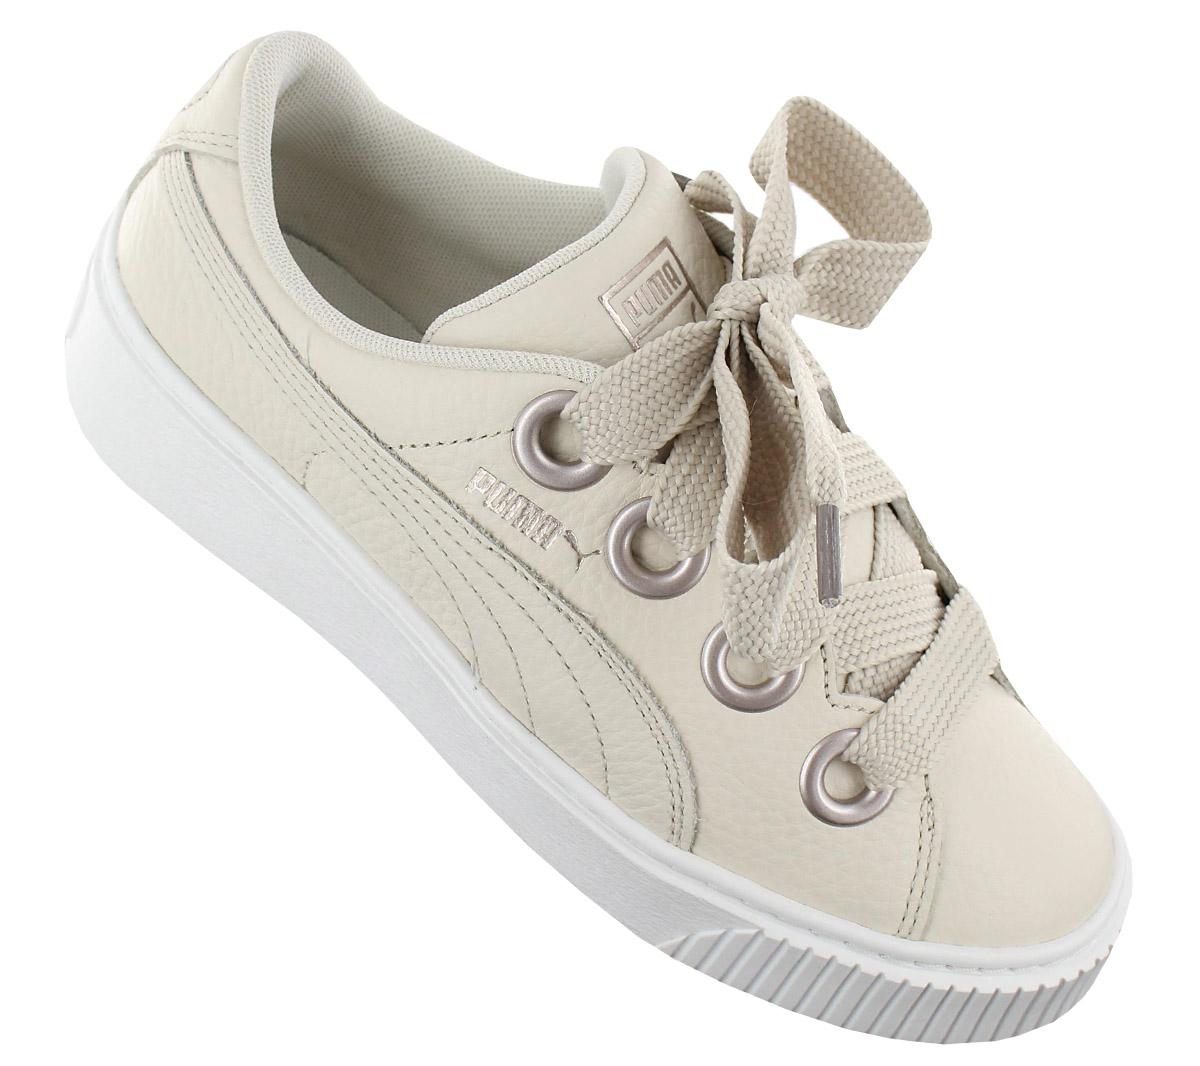 94c47c4b58a Puma Platform Kiss Leather Women s Sneakers Shoe Basket 366460-02